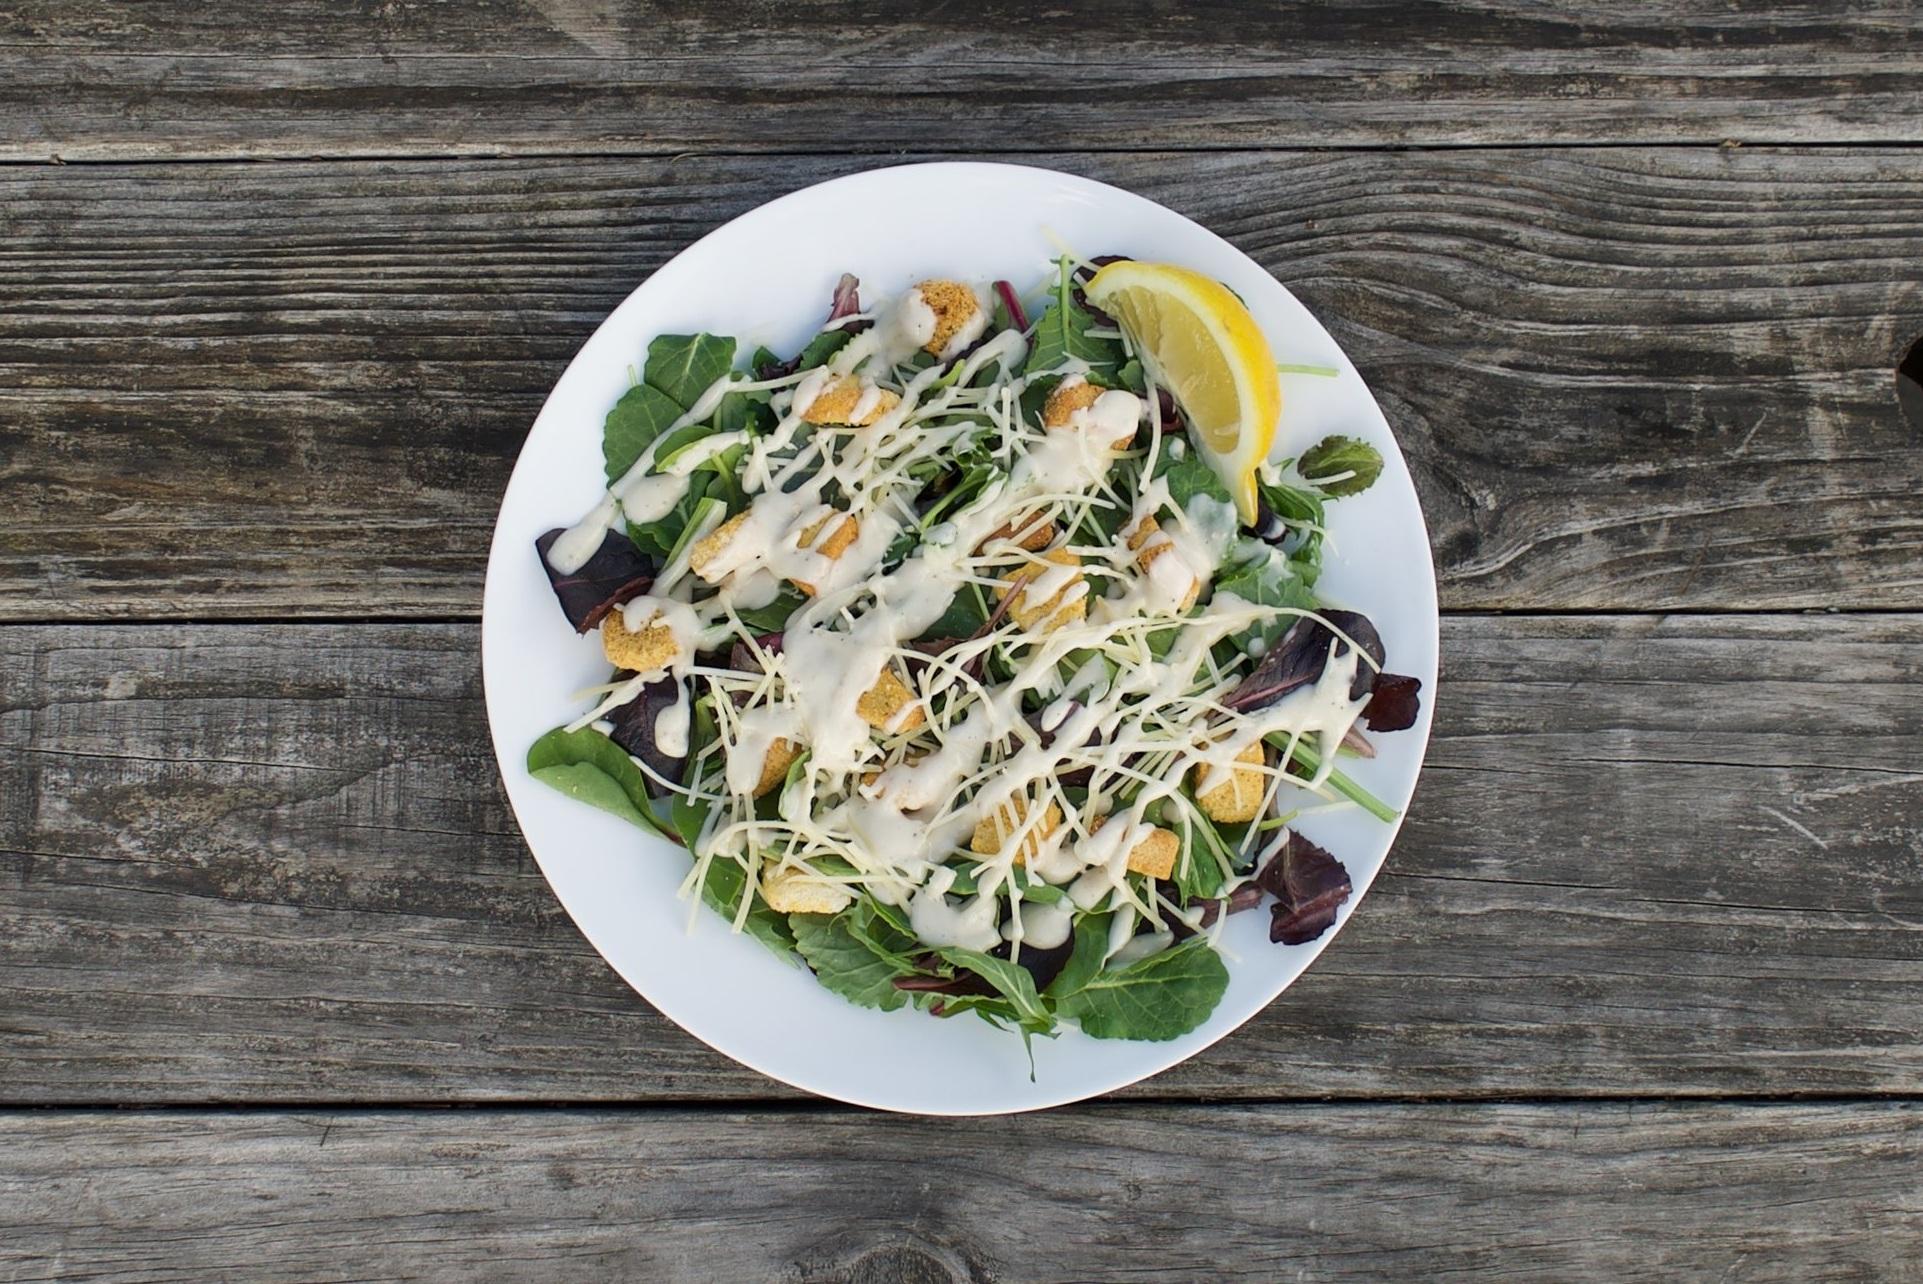 caesar salad. $7 - MIXED GREENS | CROUTONS | SHREDDED PARMESAN | FRESH LEMON | CAESAR DRESSING